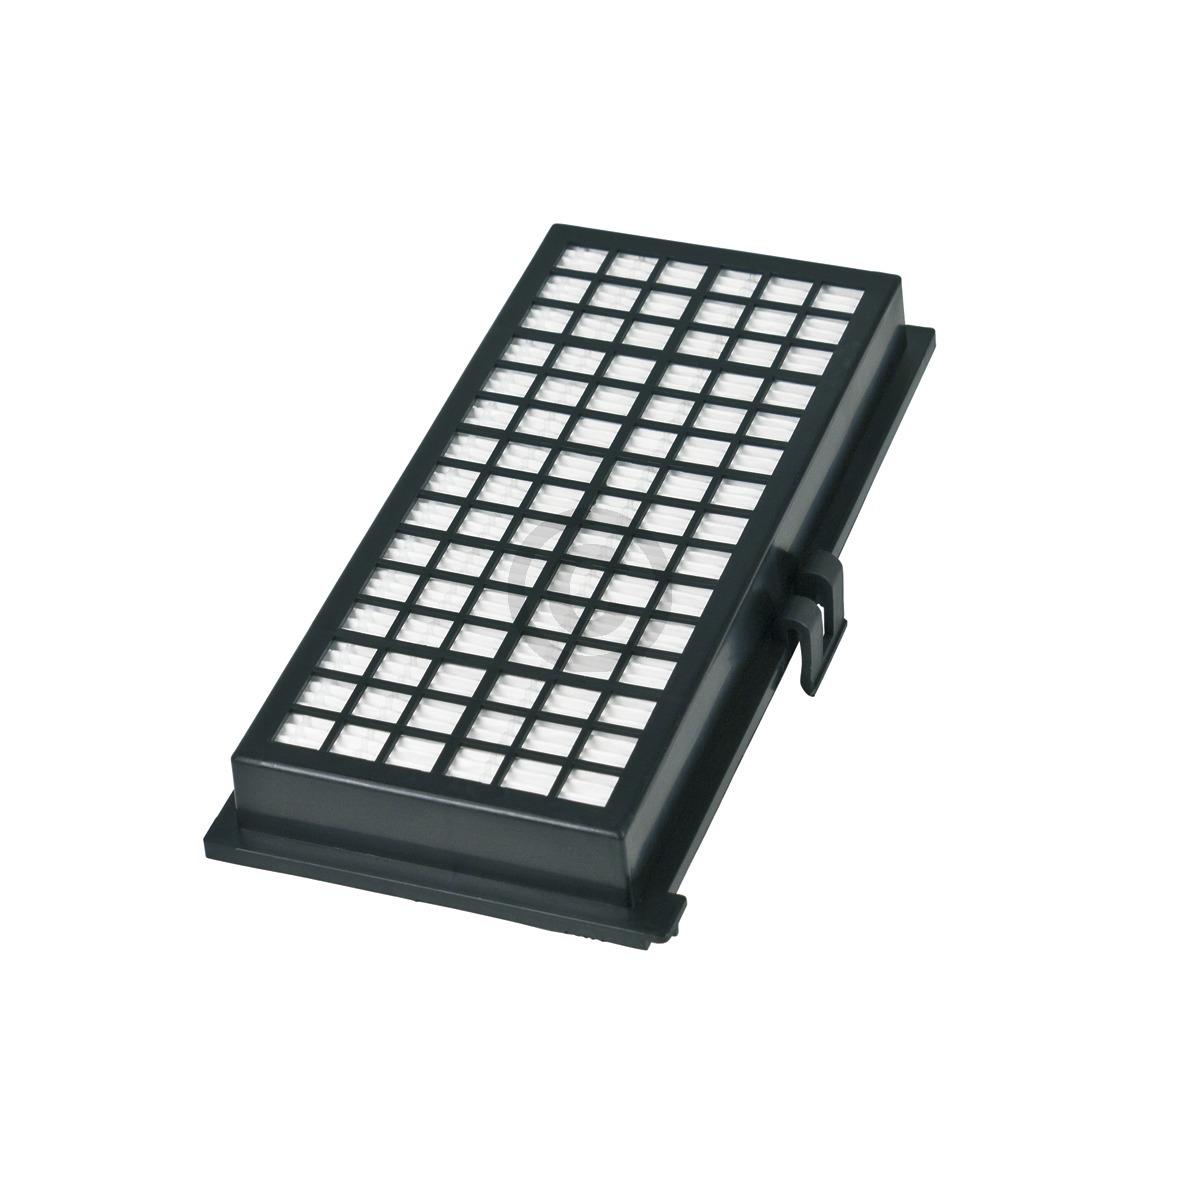 Wonderbaar Abluftfilterkassette Filter Miele 9616270 AT! - ABEA Hausgeräte SQ-16